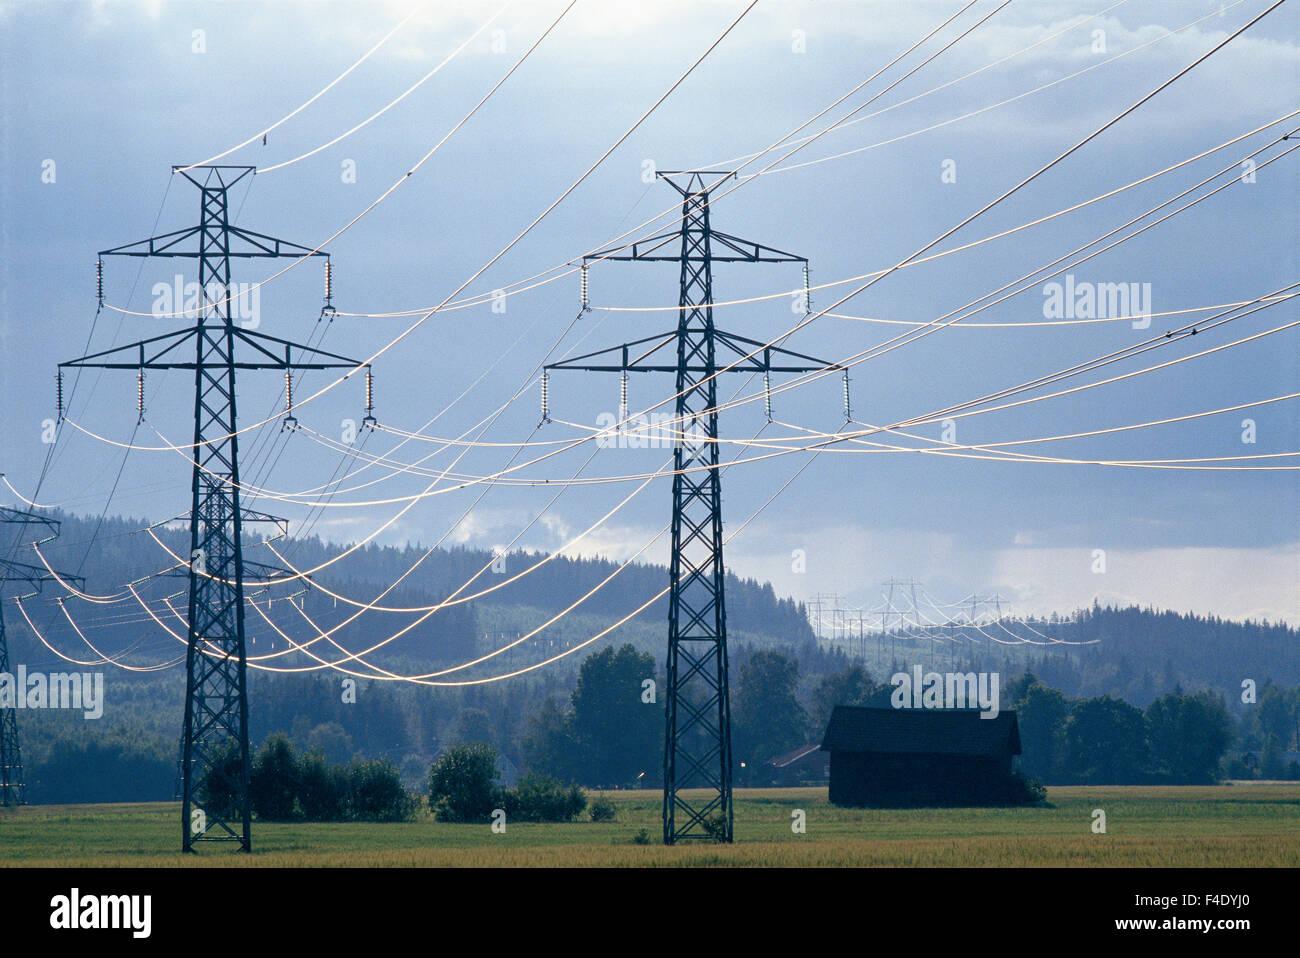 Power transmission lines, Dalarna, Sweden. - Stock Image